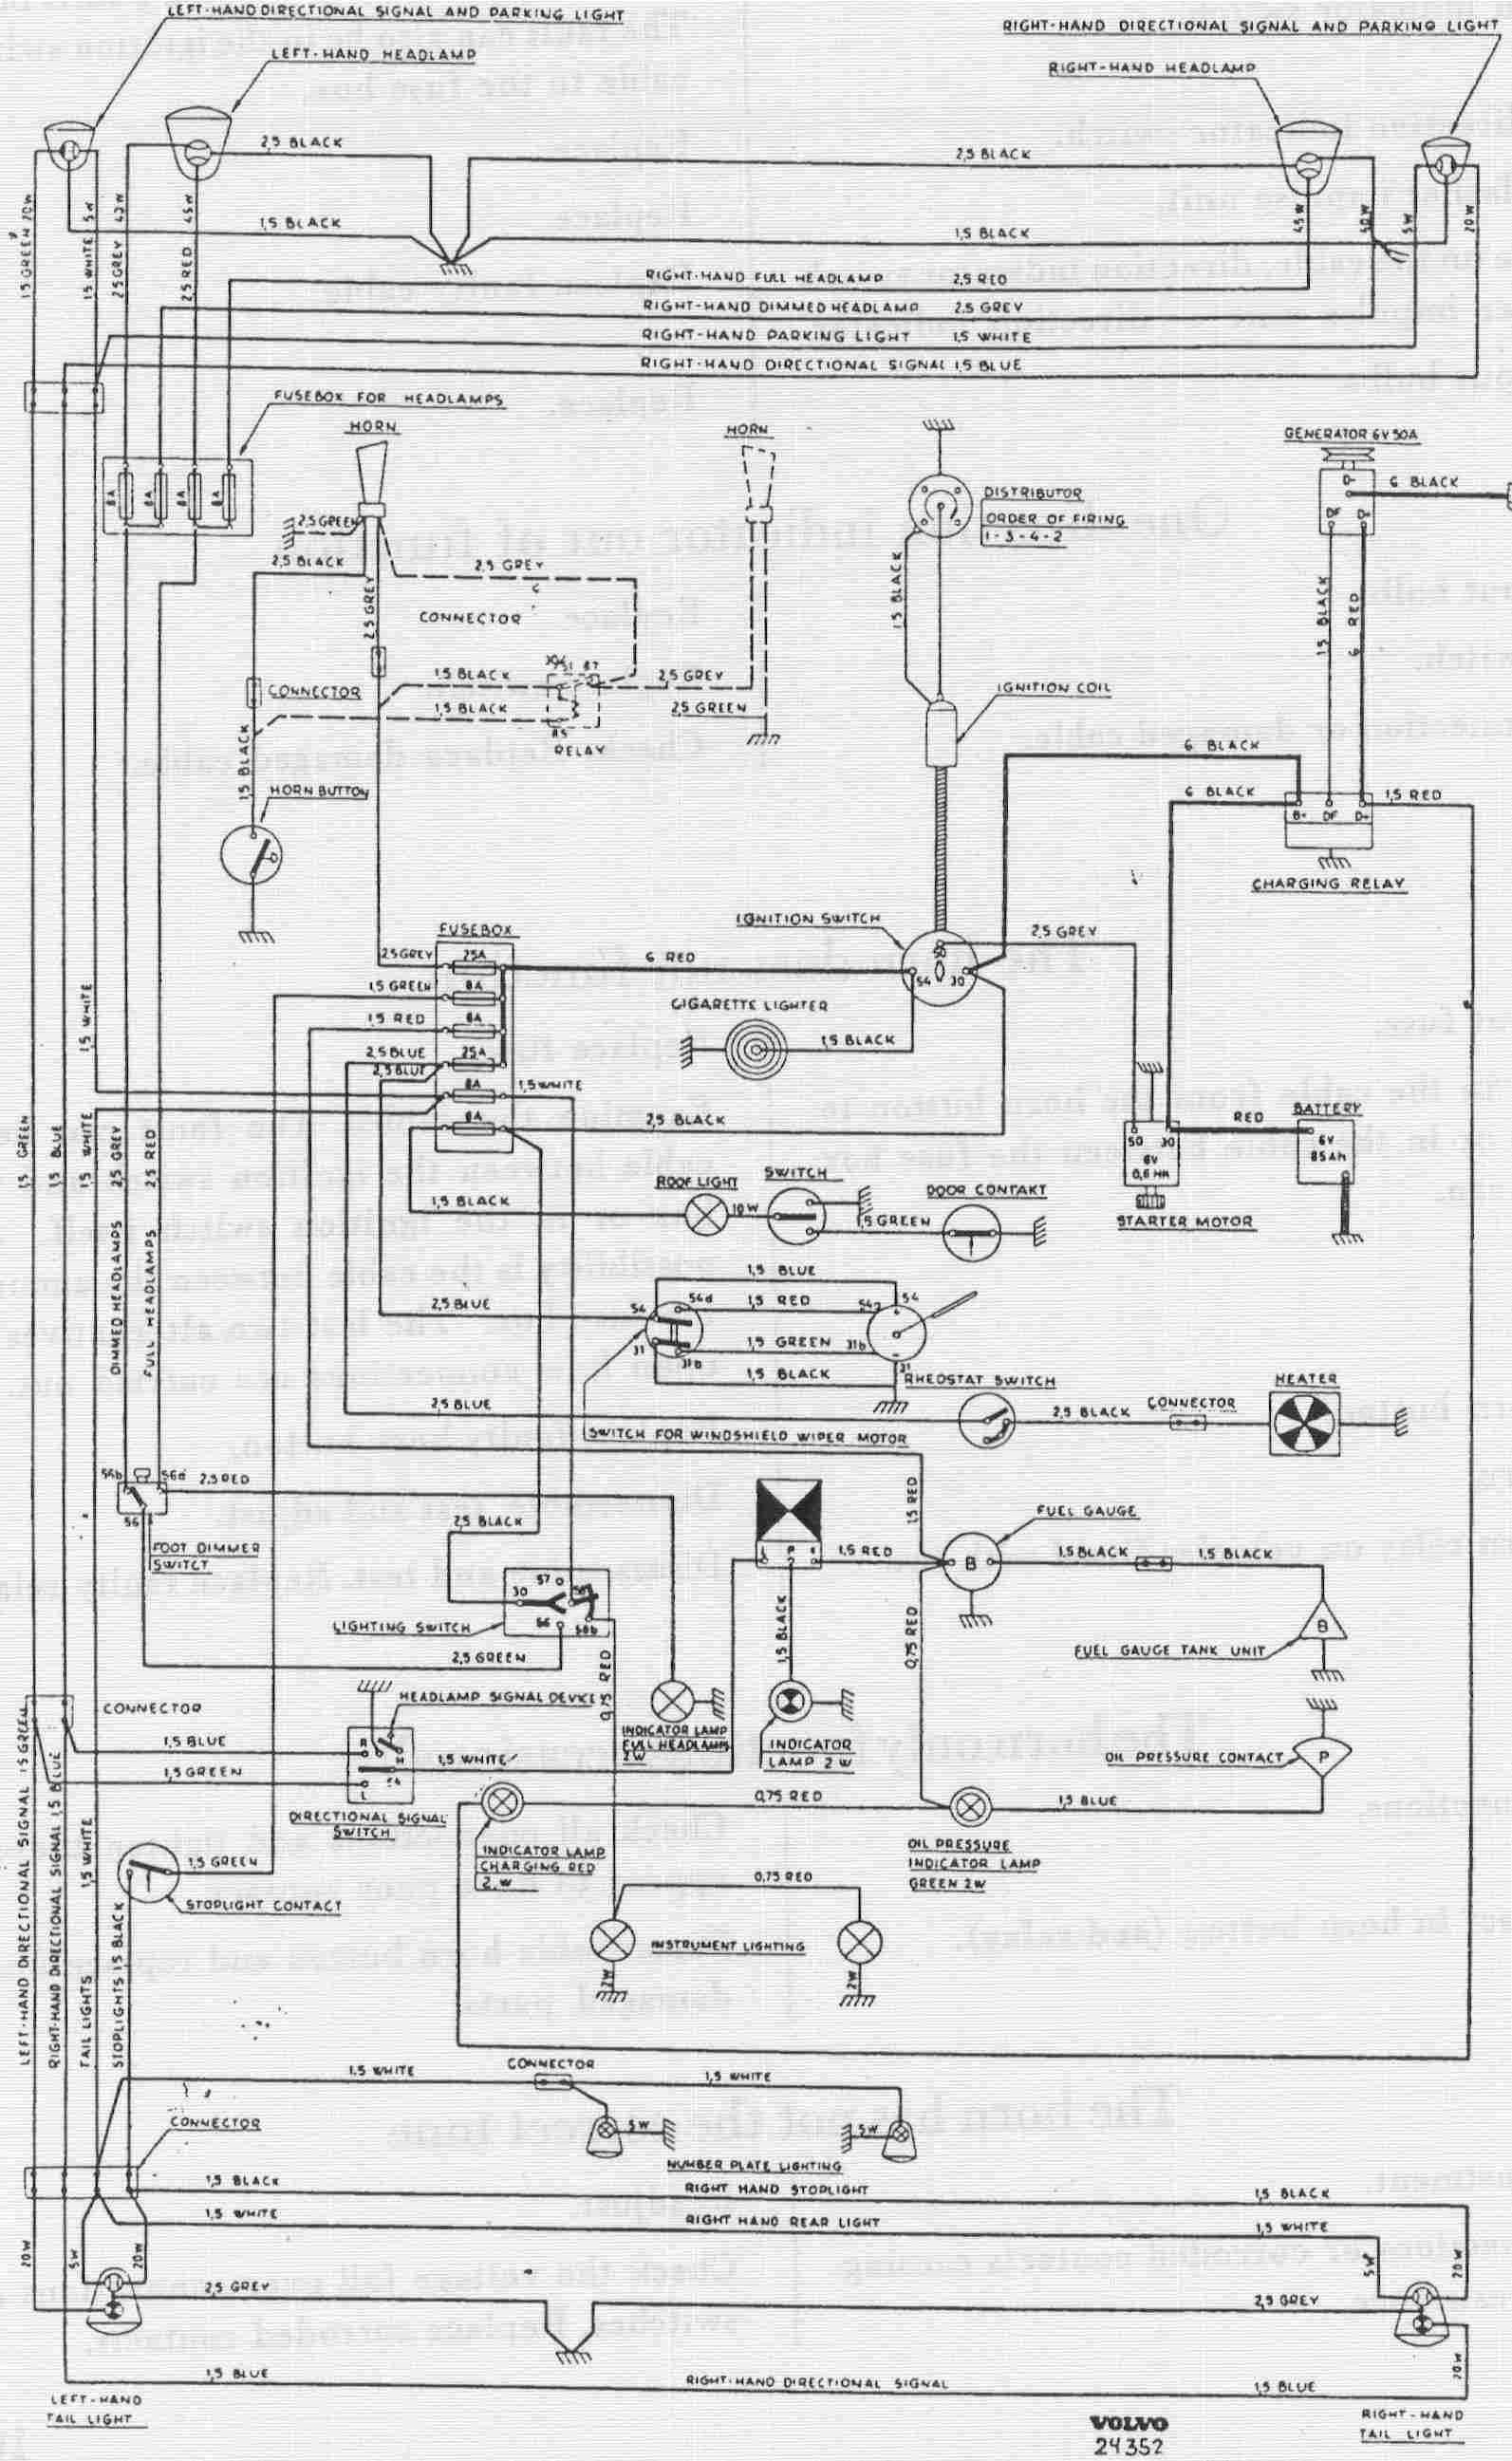 Outstanding Haltech E6x Wiring Diagram Illustration - Best Images ...